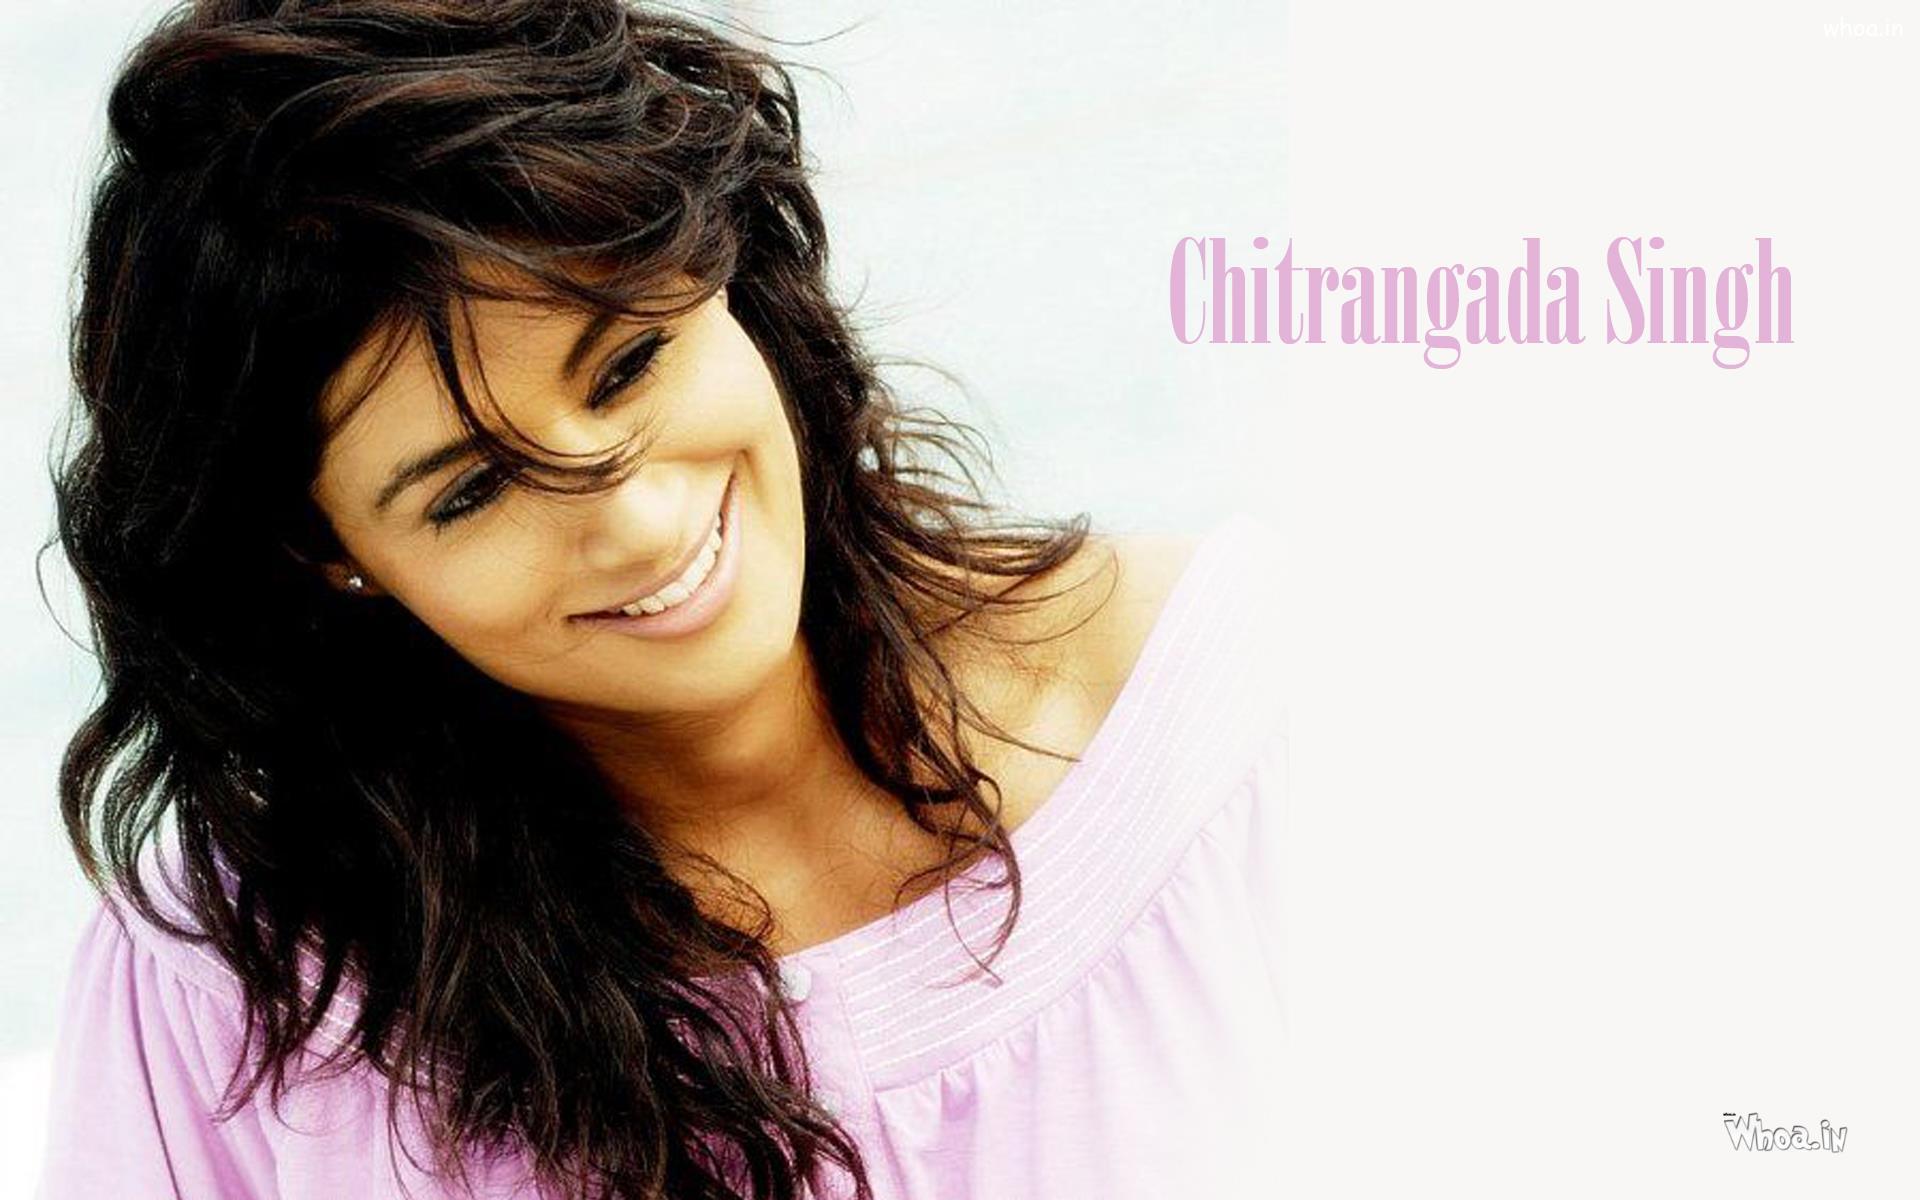 beautiful chitrangada singh with a cute smile hd